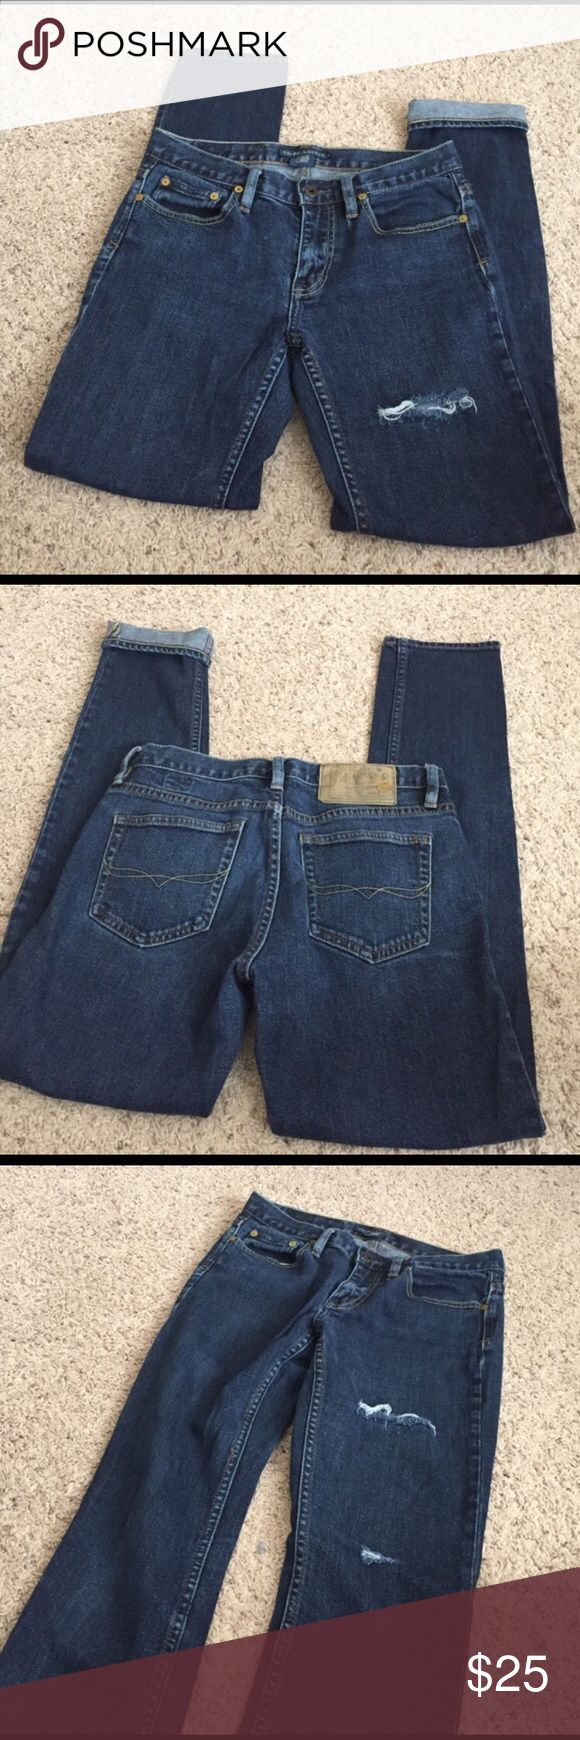 "Ralph Lauren ""Thompson 650"" skinny jeans Reposhing-too small for me. Ralph Lauren Jeans Skinny"